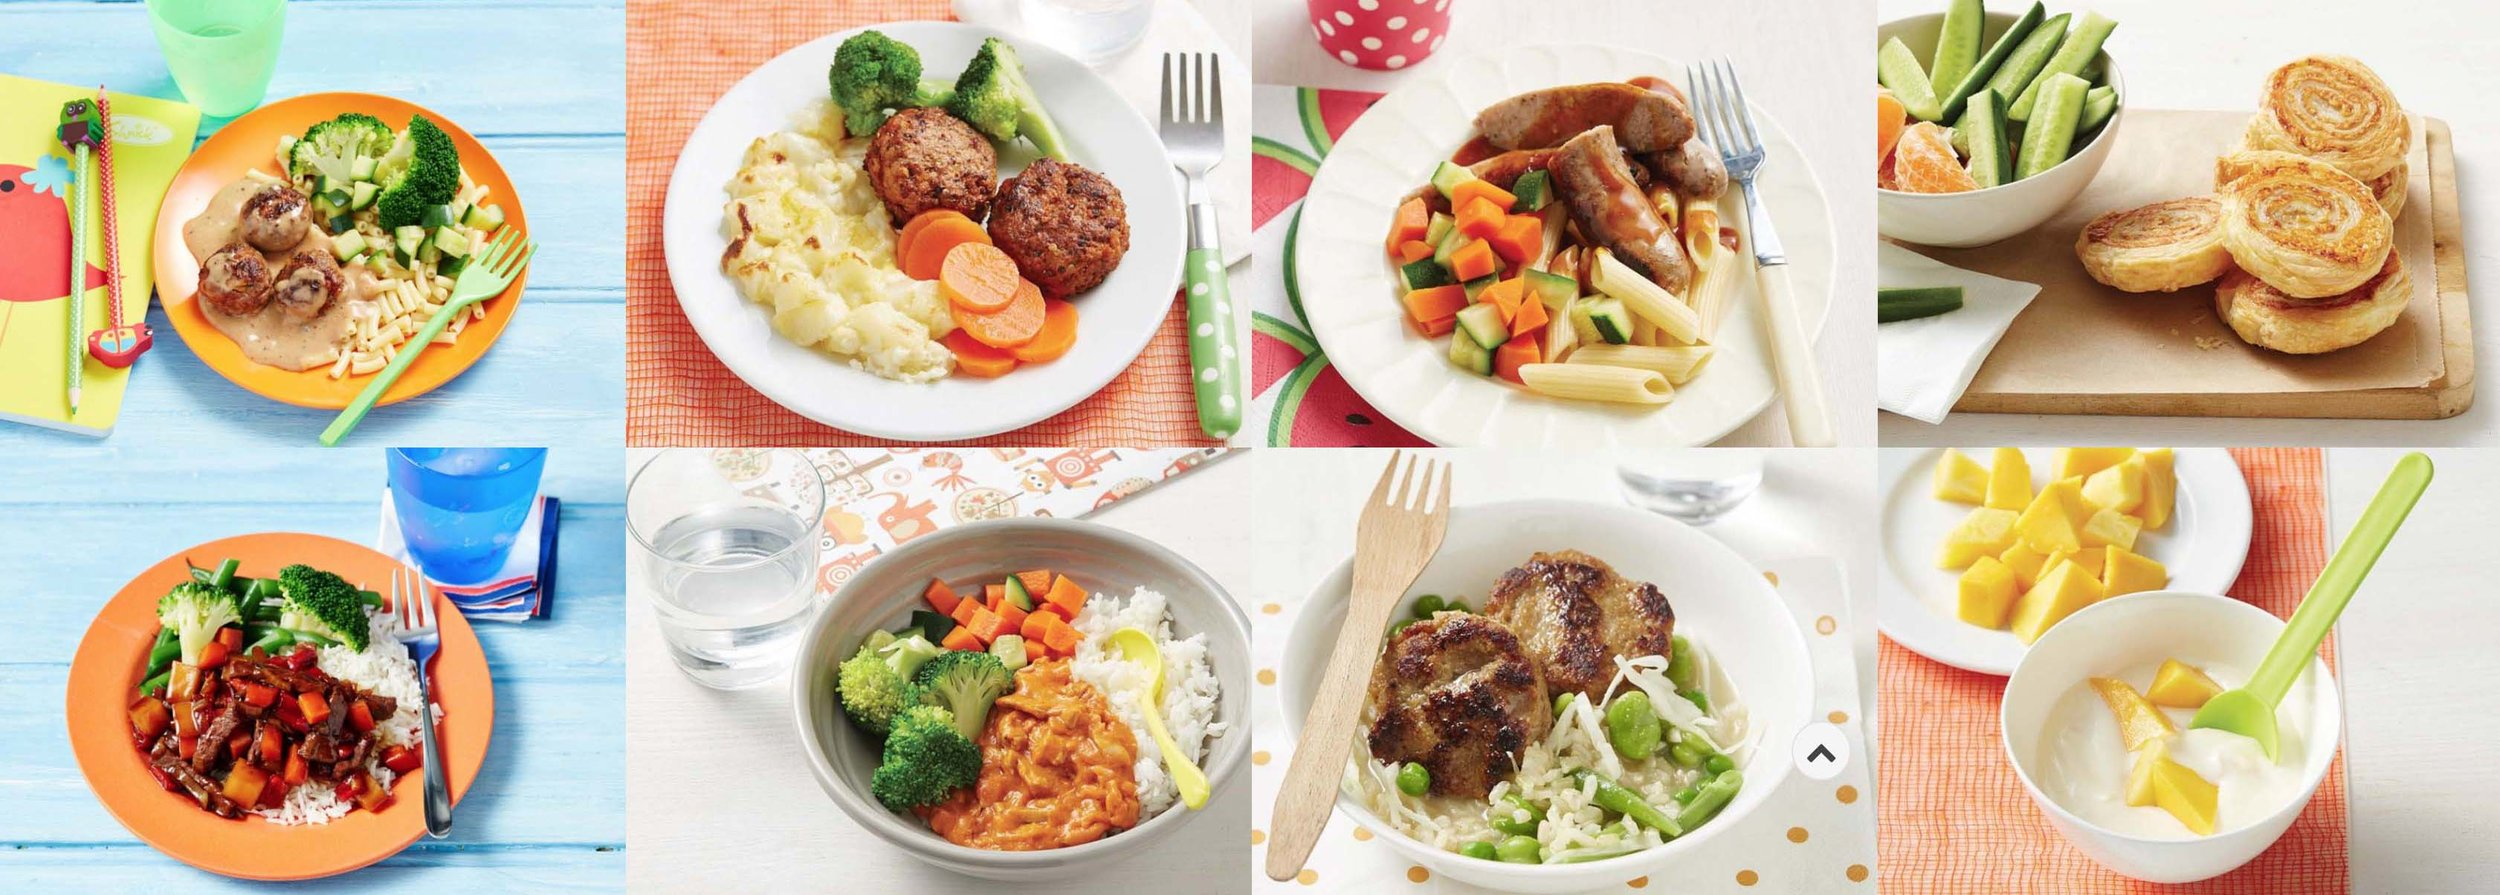 !LongBanner_Food01.jpg